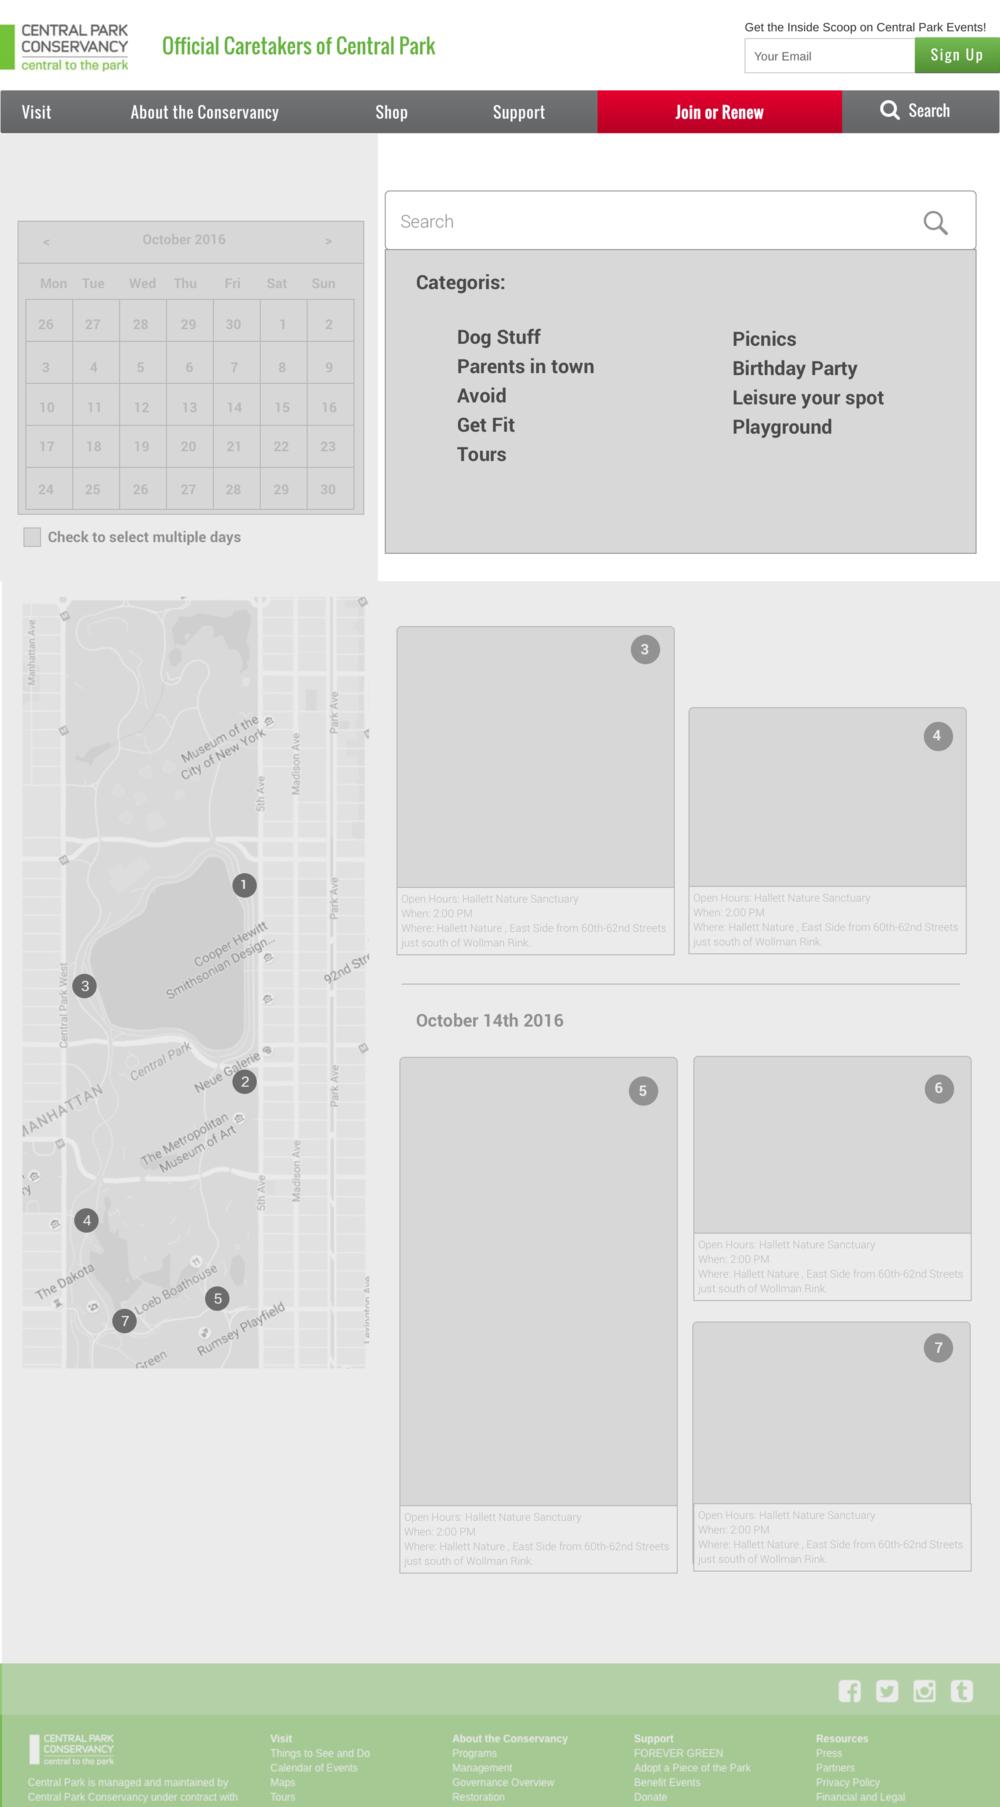 SMART FILTER   To find events based on categories